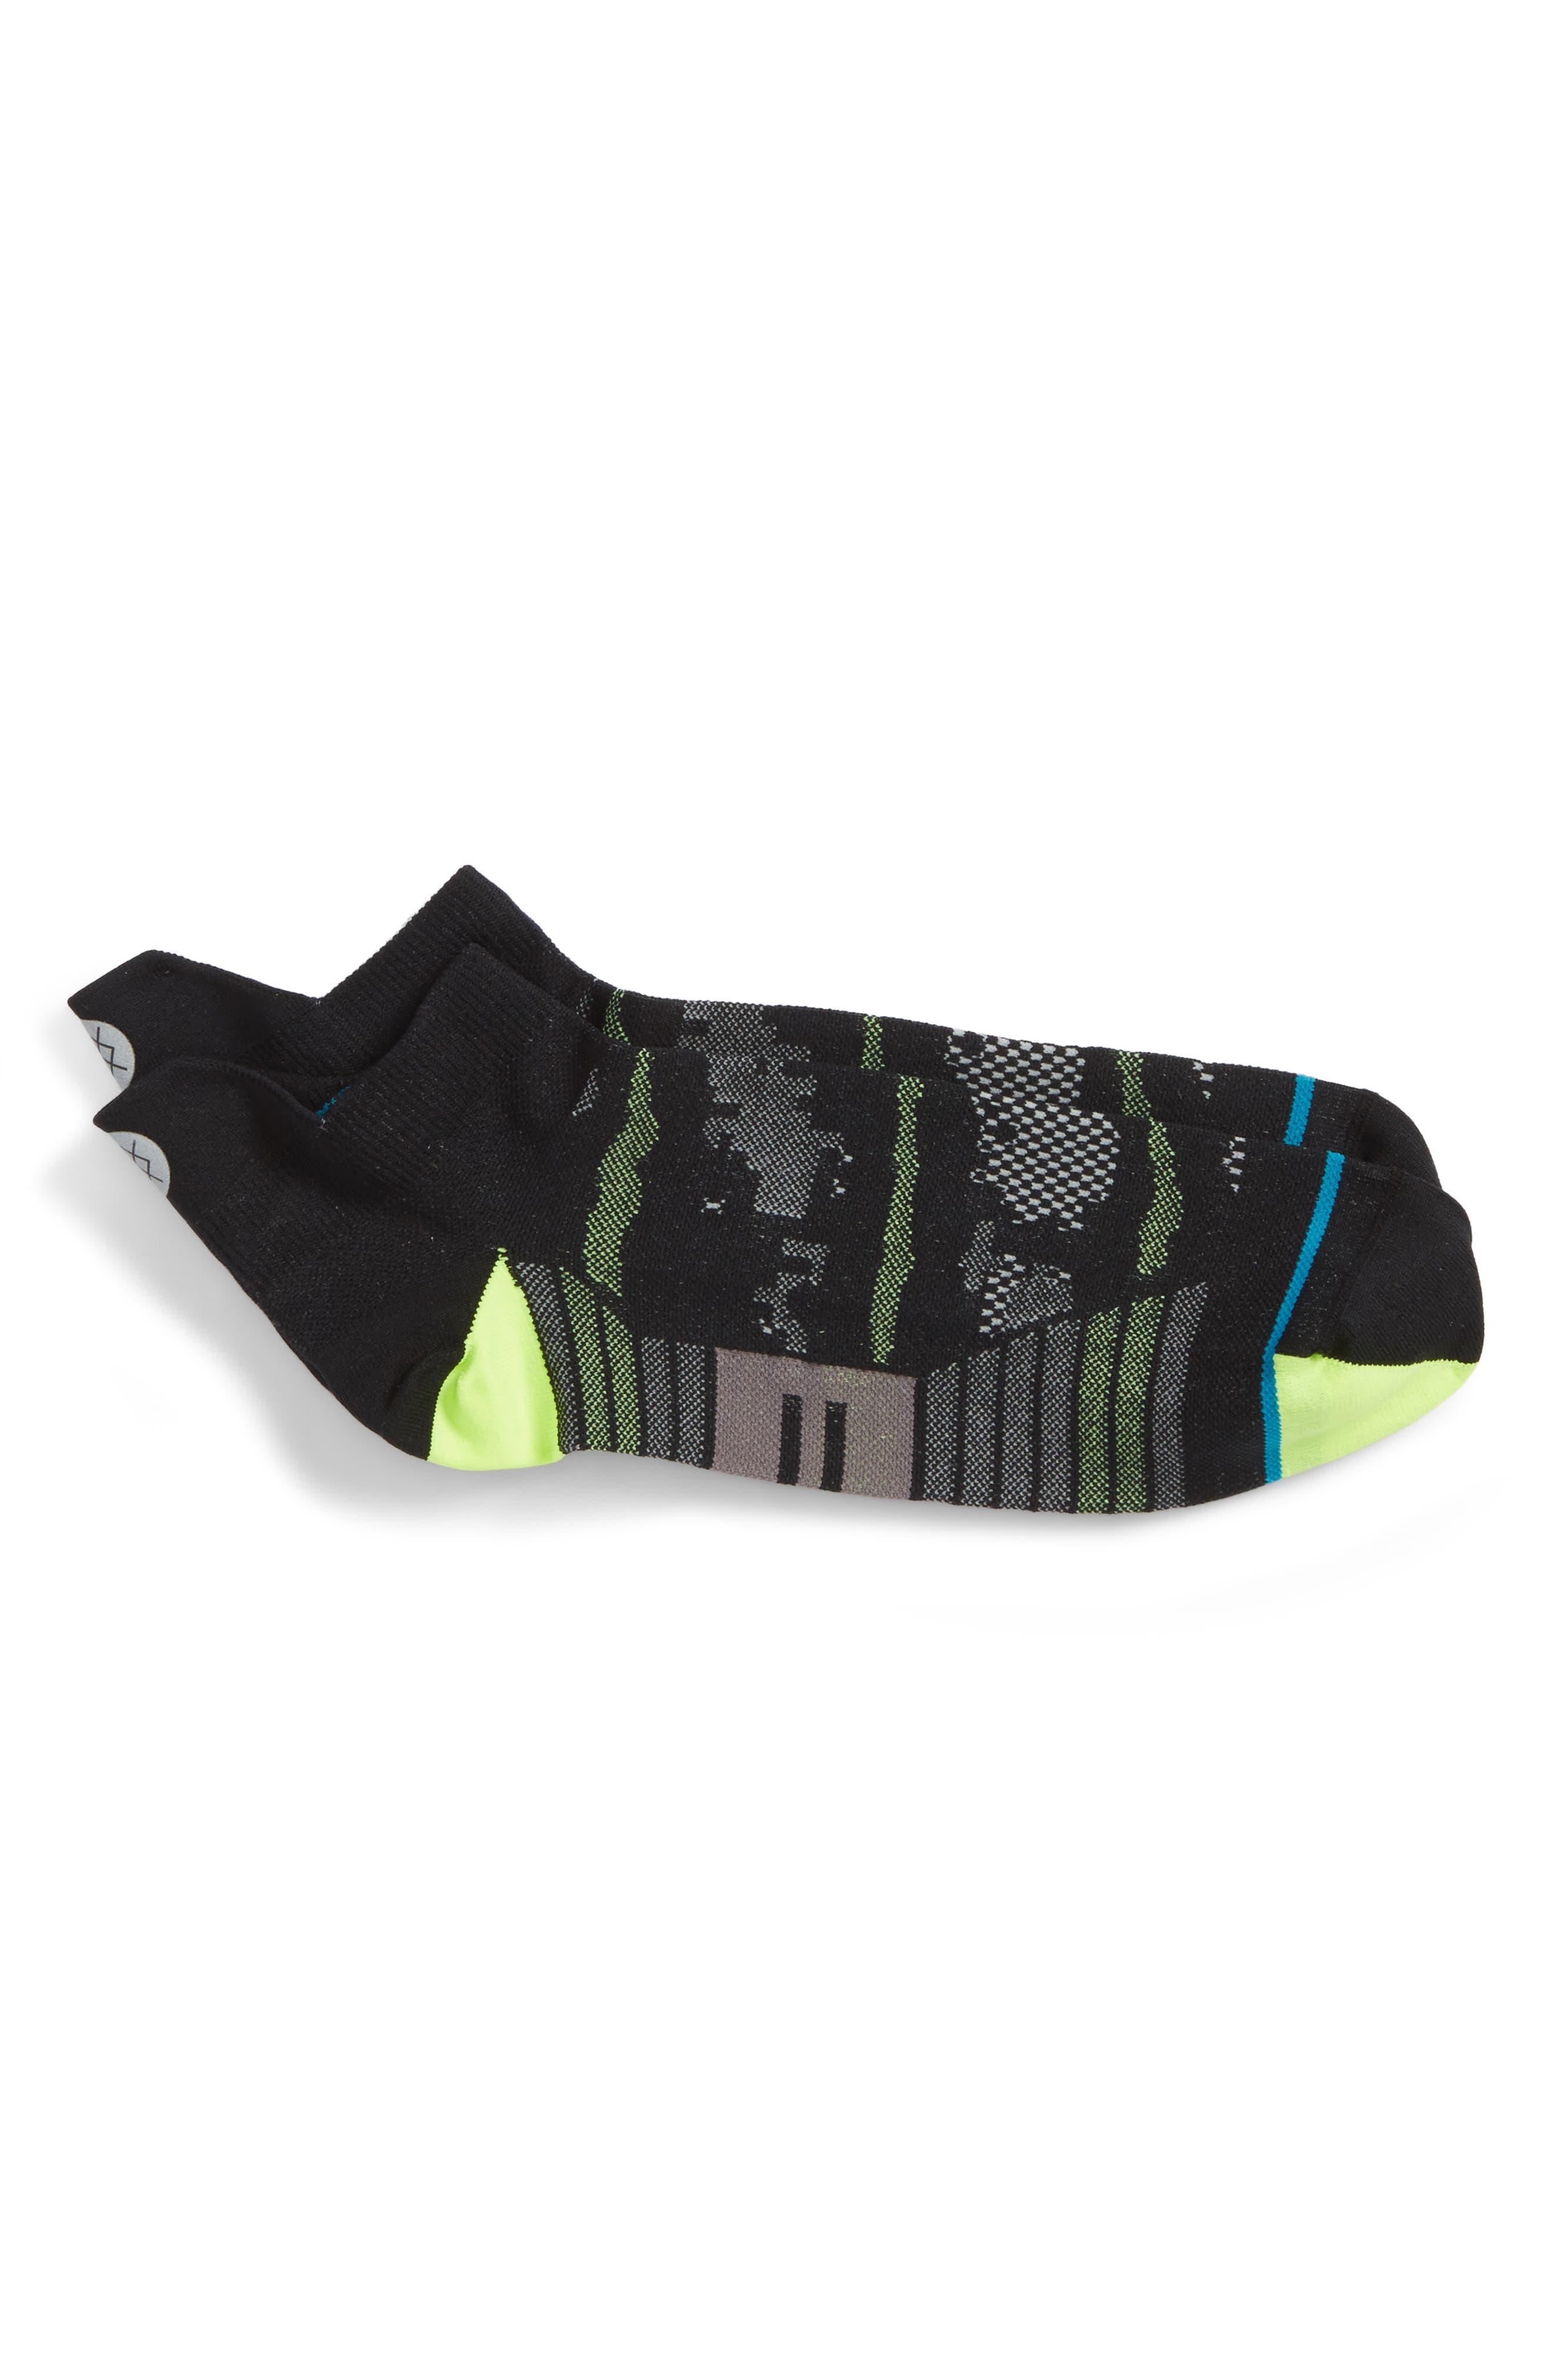 Night Light Tab Socks,                             Main thumbnail 1, color,                             001